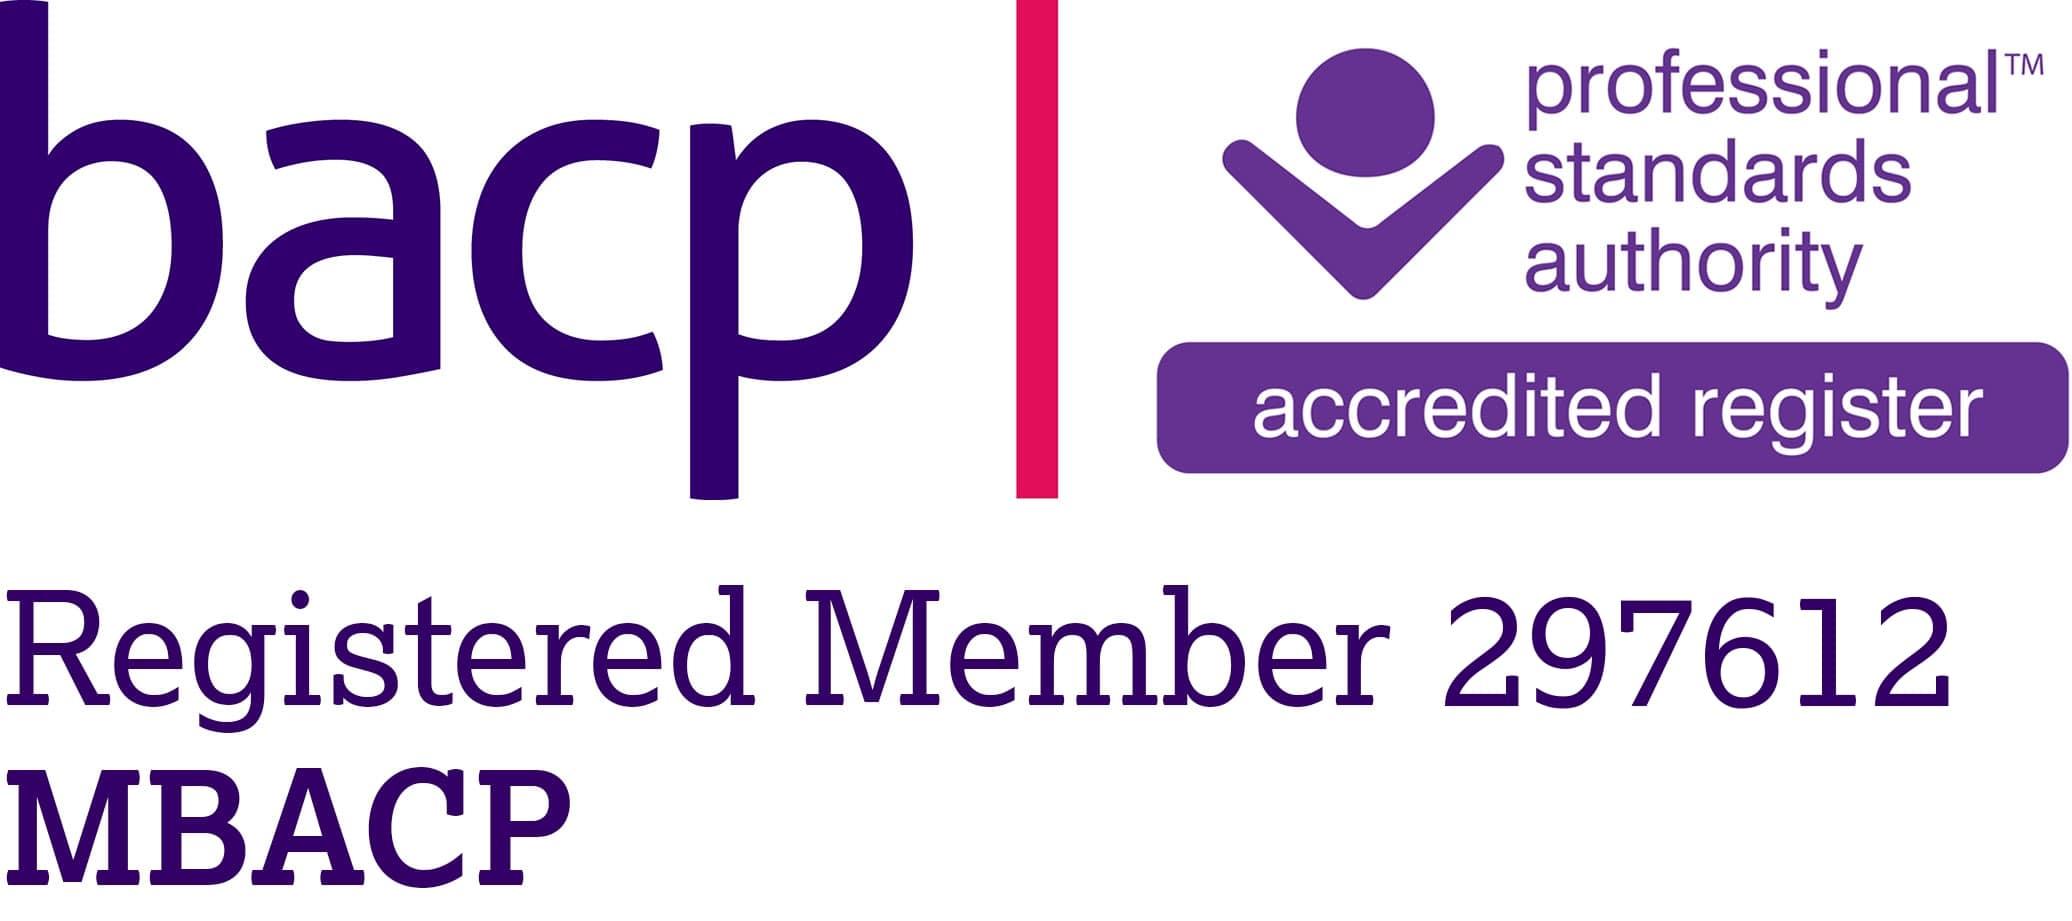 BACP Logo accreditation